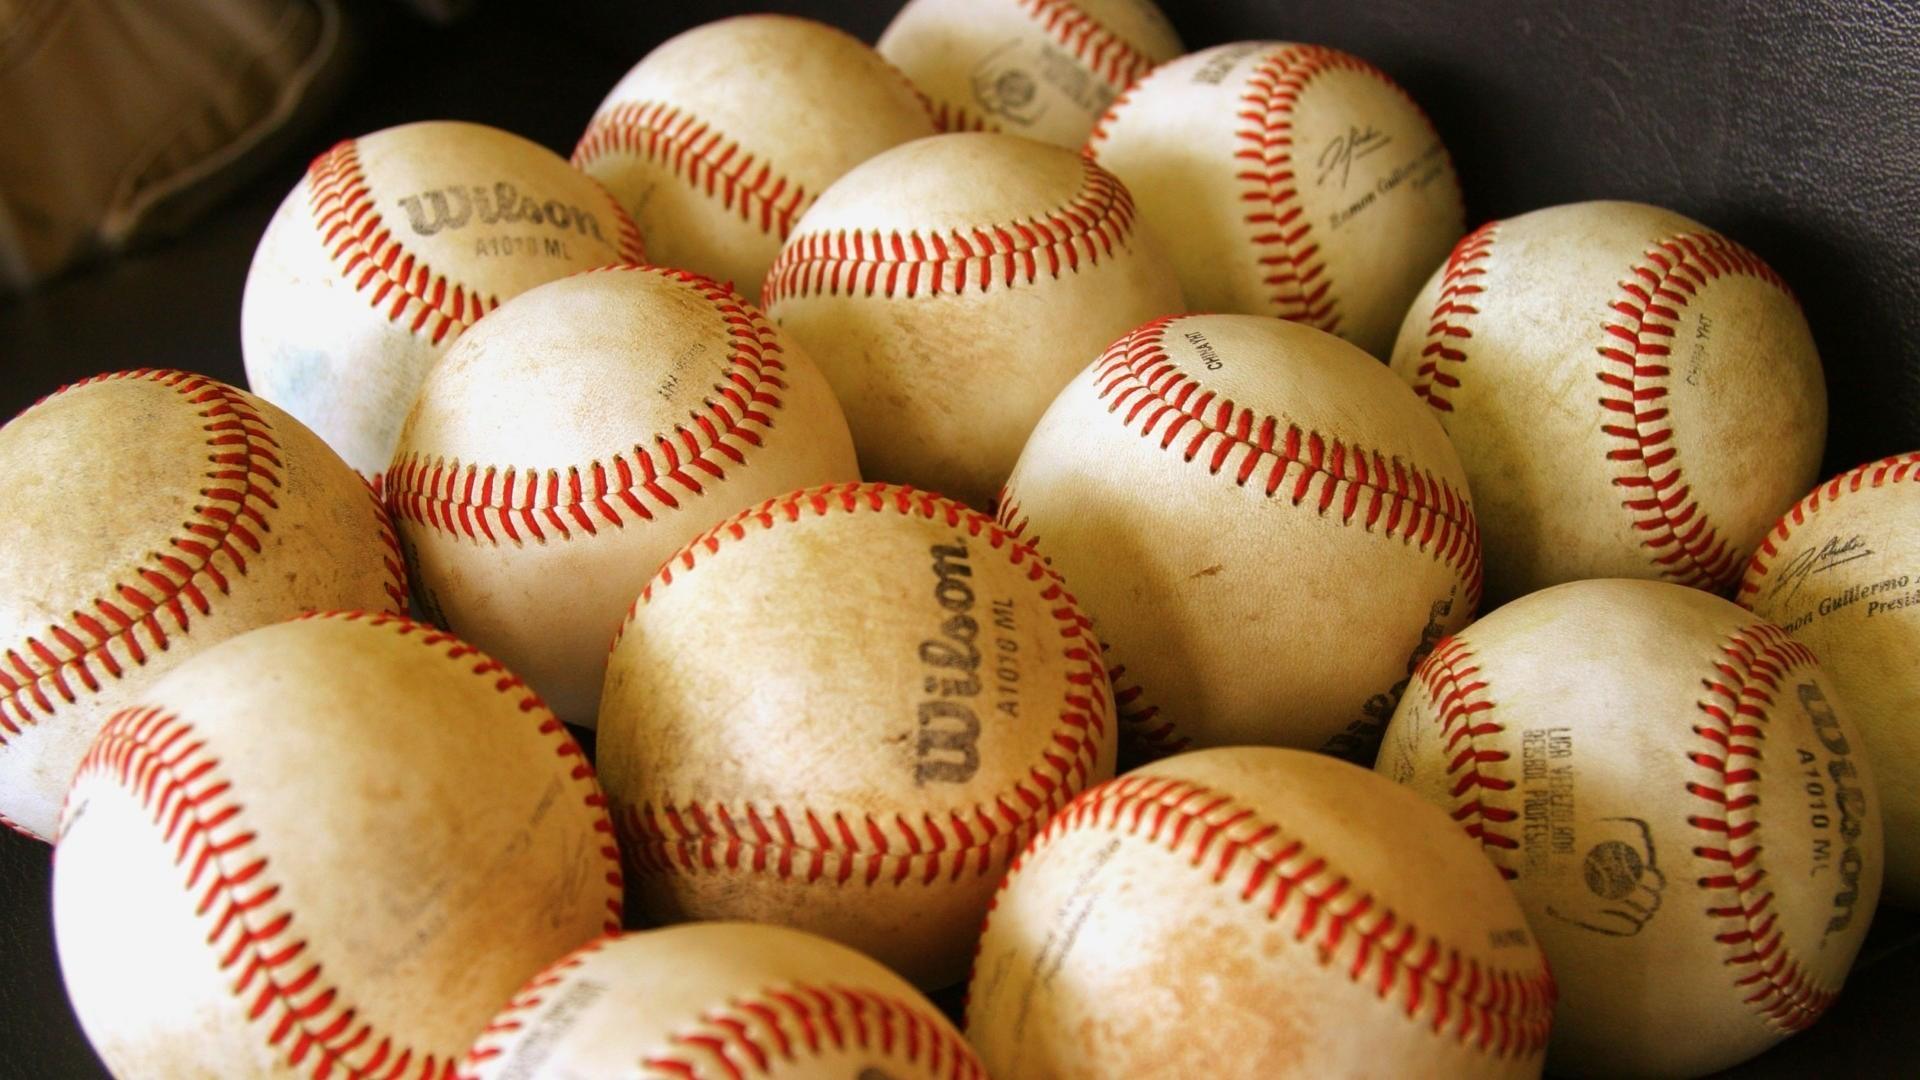 Sport Wallpaper Baseball: Cool Baseball Backgrounds (60+ Pictures